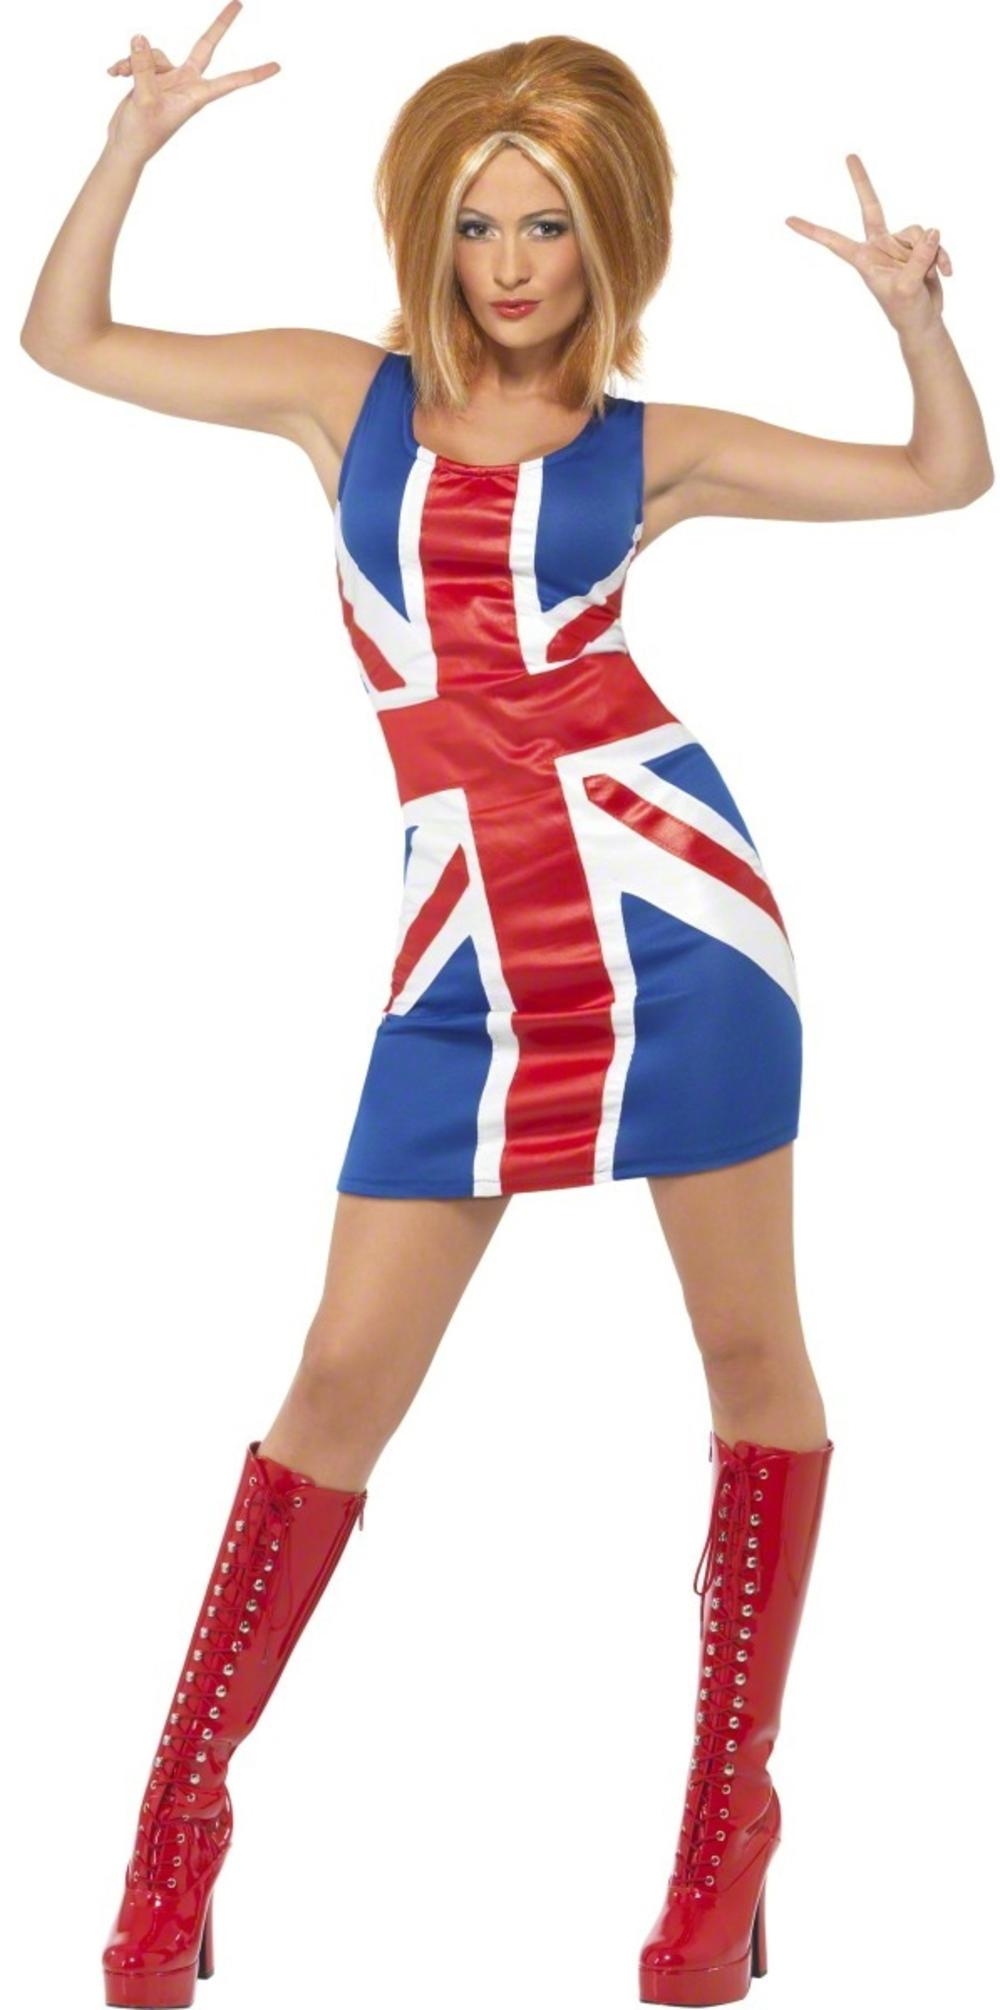 Union Jack Fancy Dress Ladies Spice Girl Pop Star National Celebrity Costume New